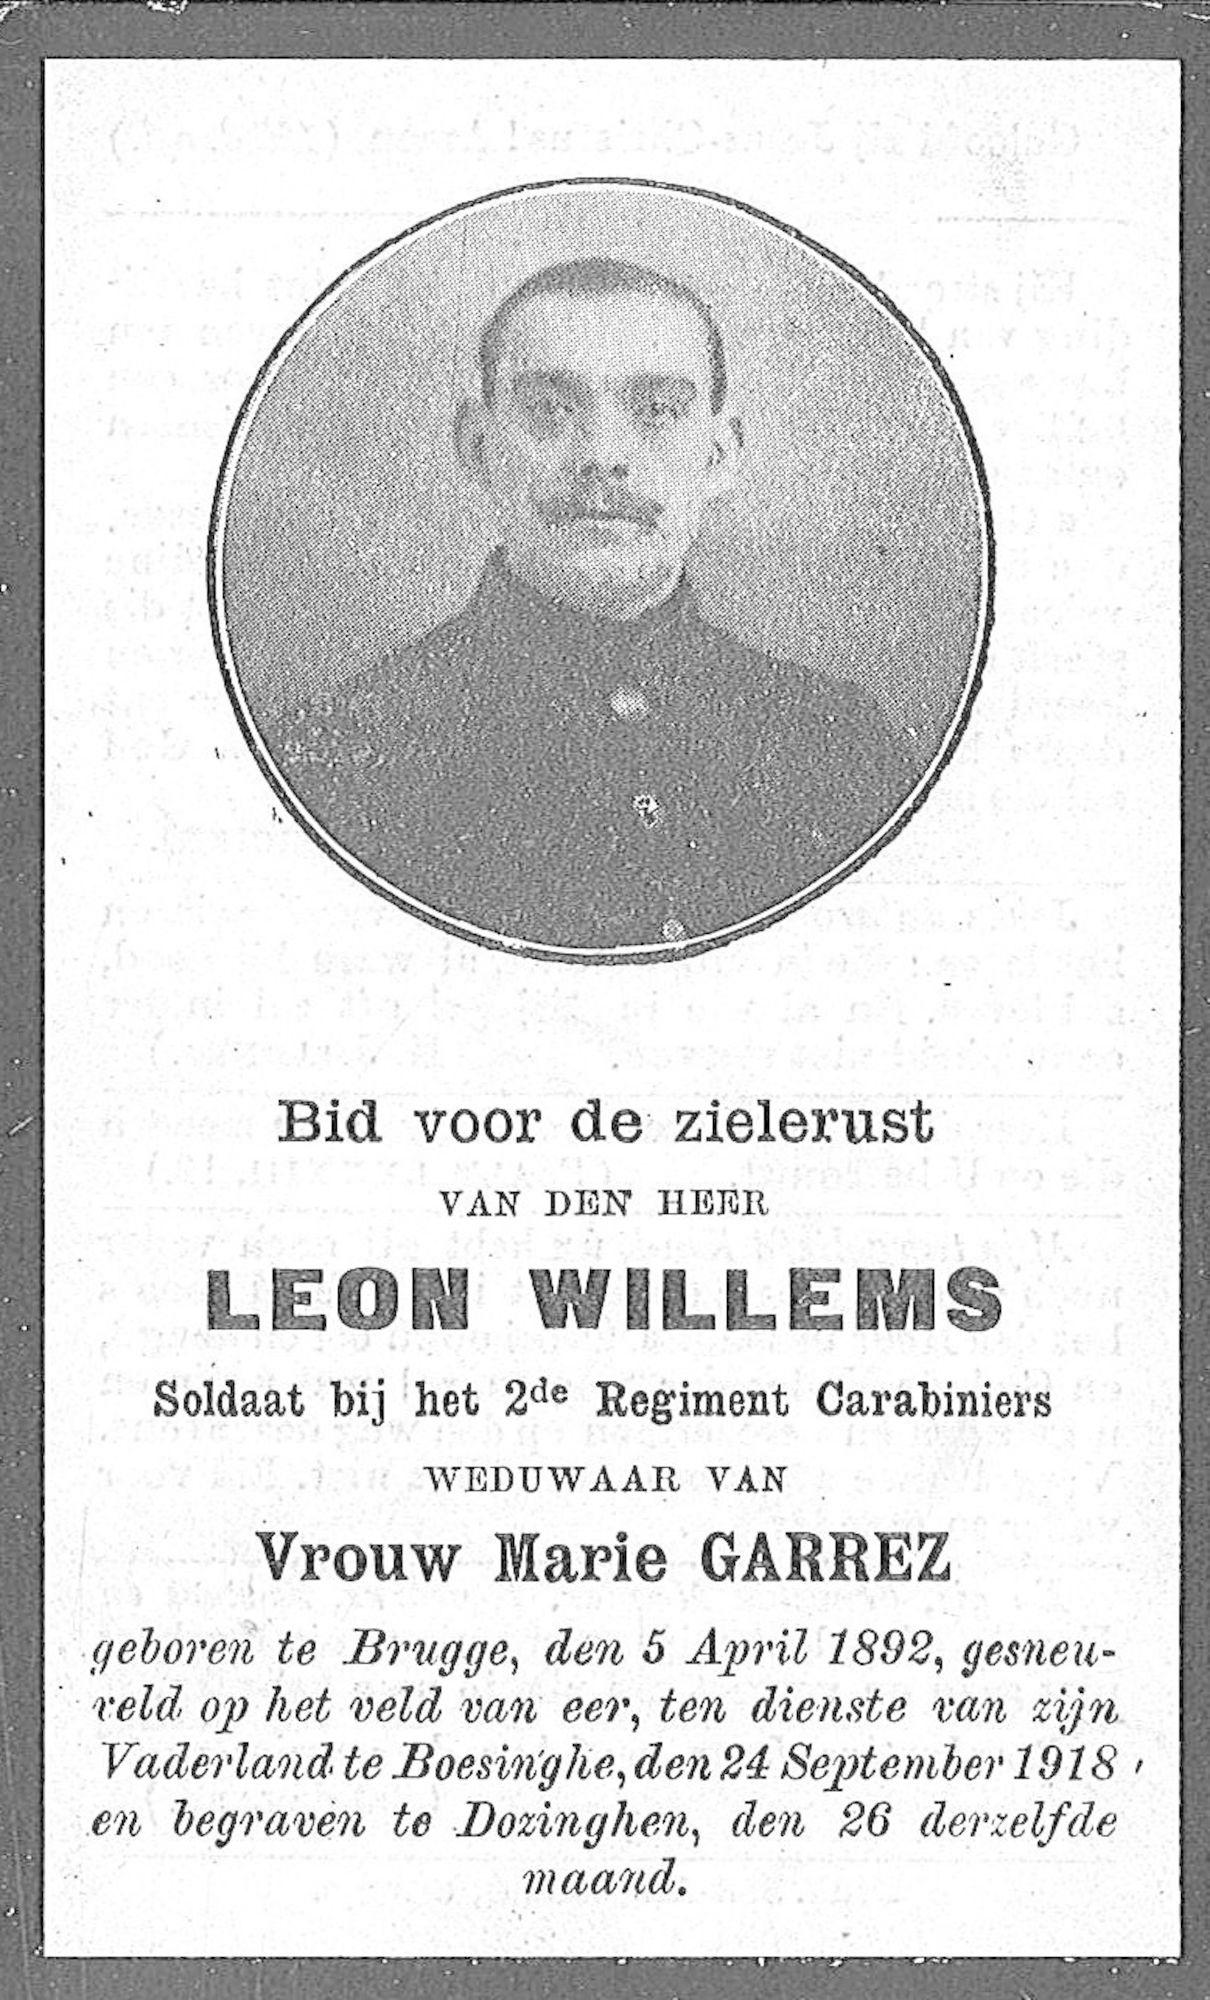 Leon Willems